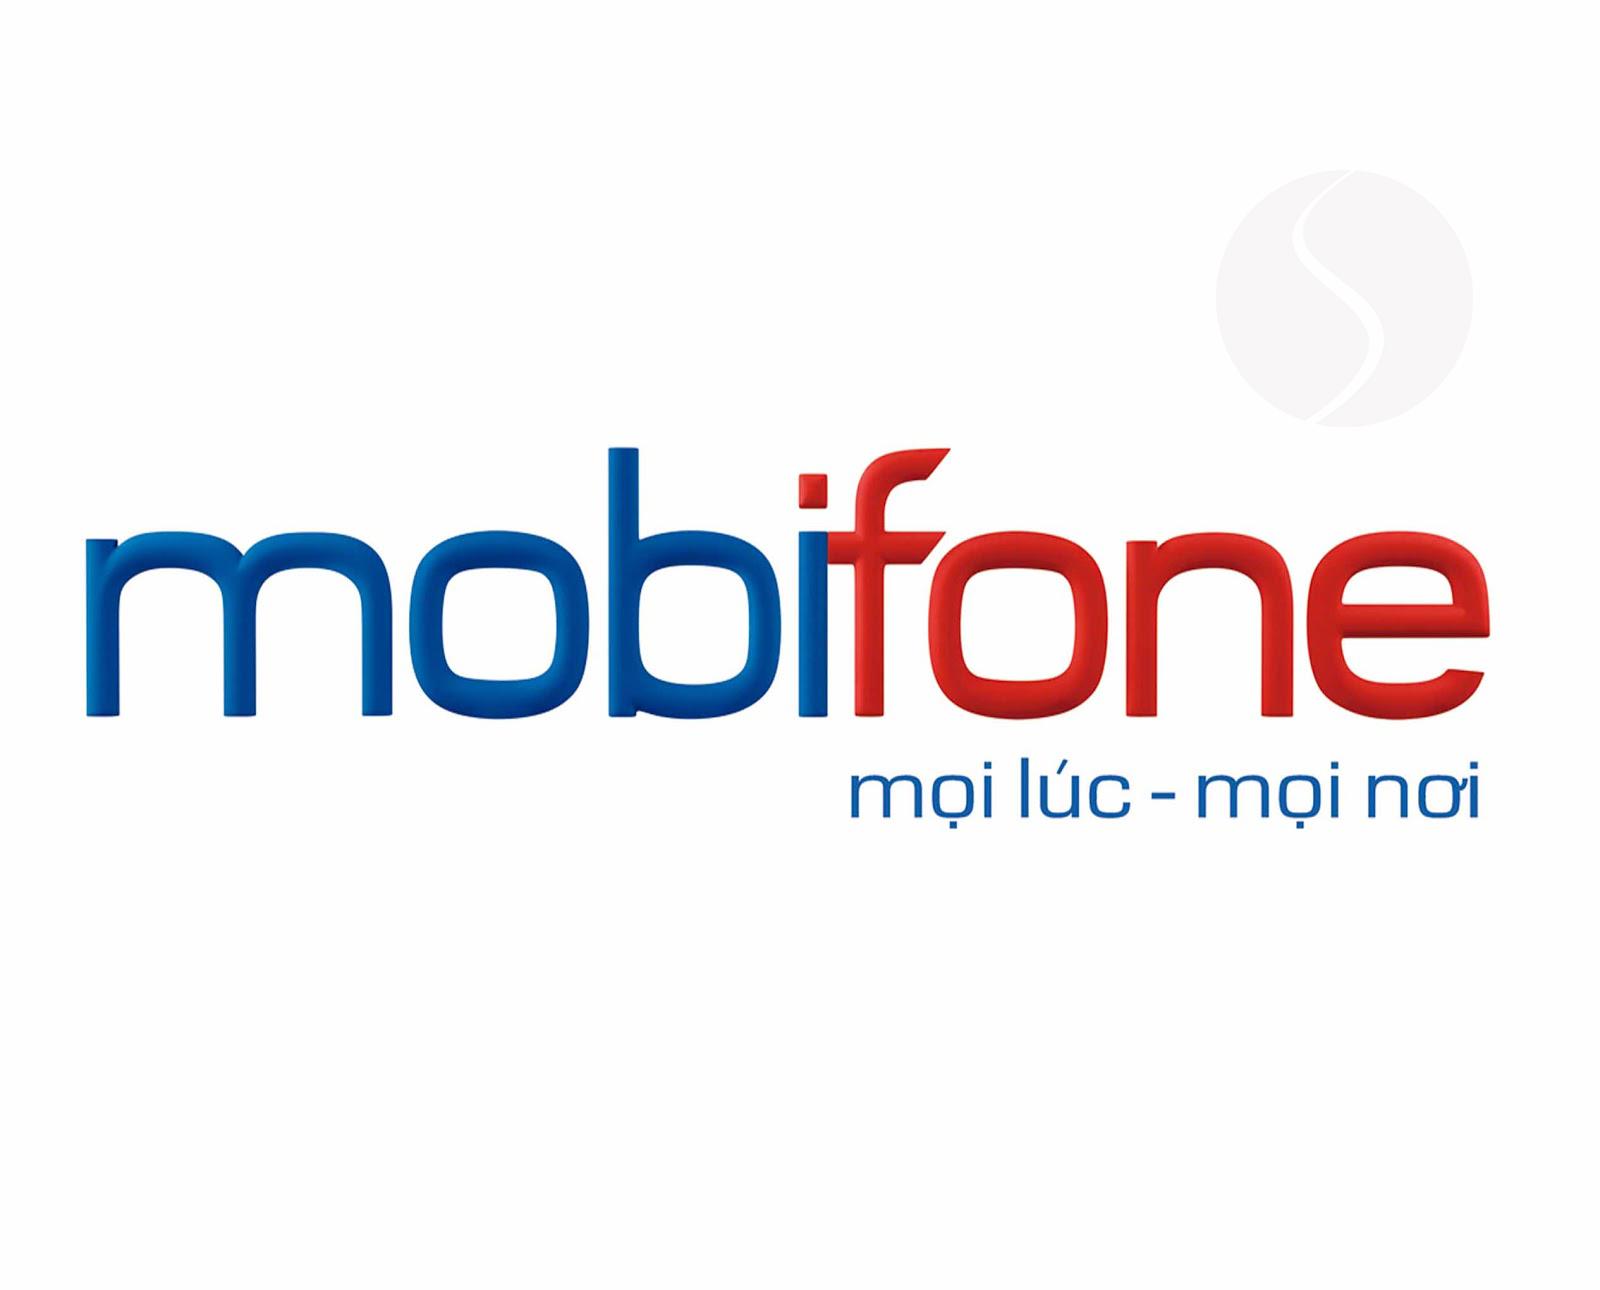 logo -mobifone